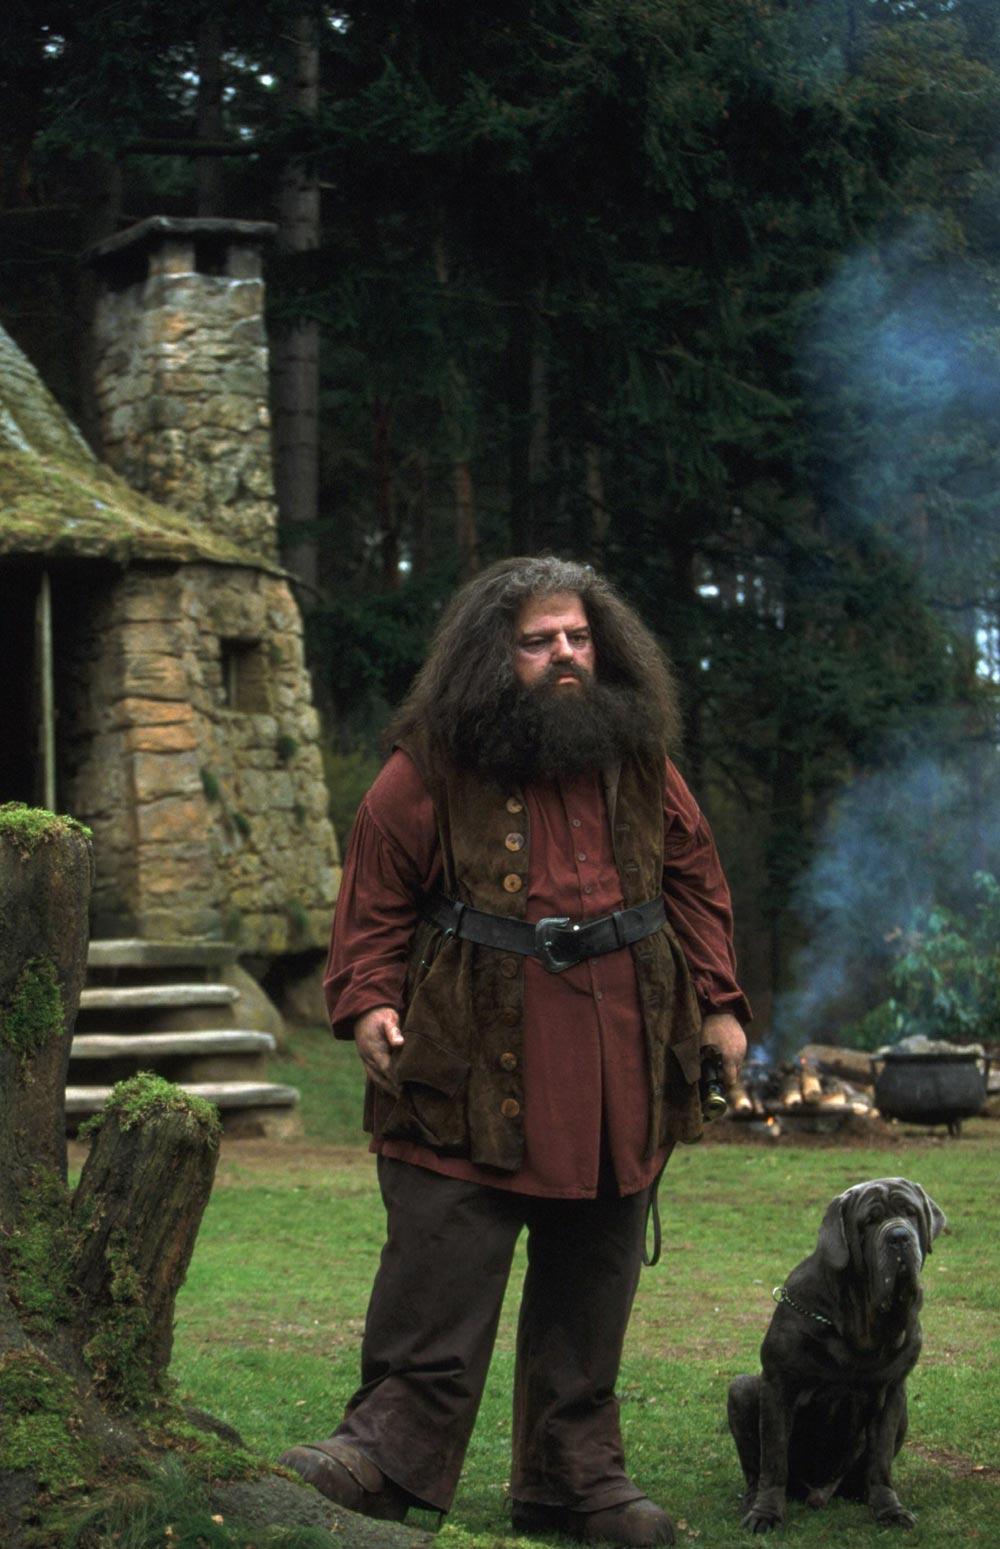 http://images.wikia.com/harrypotter/images/1/19/Hagrid_l.jpg